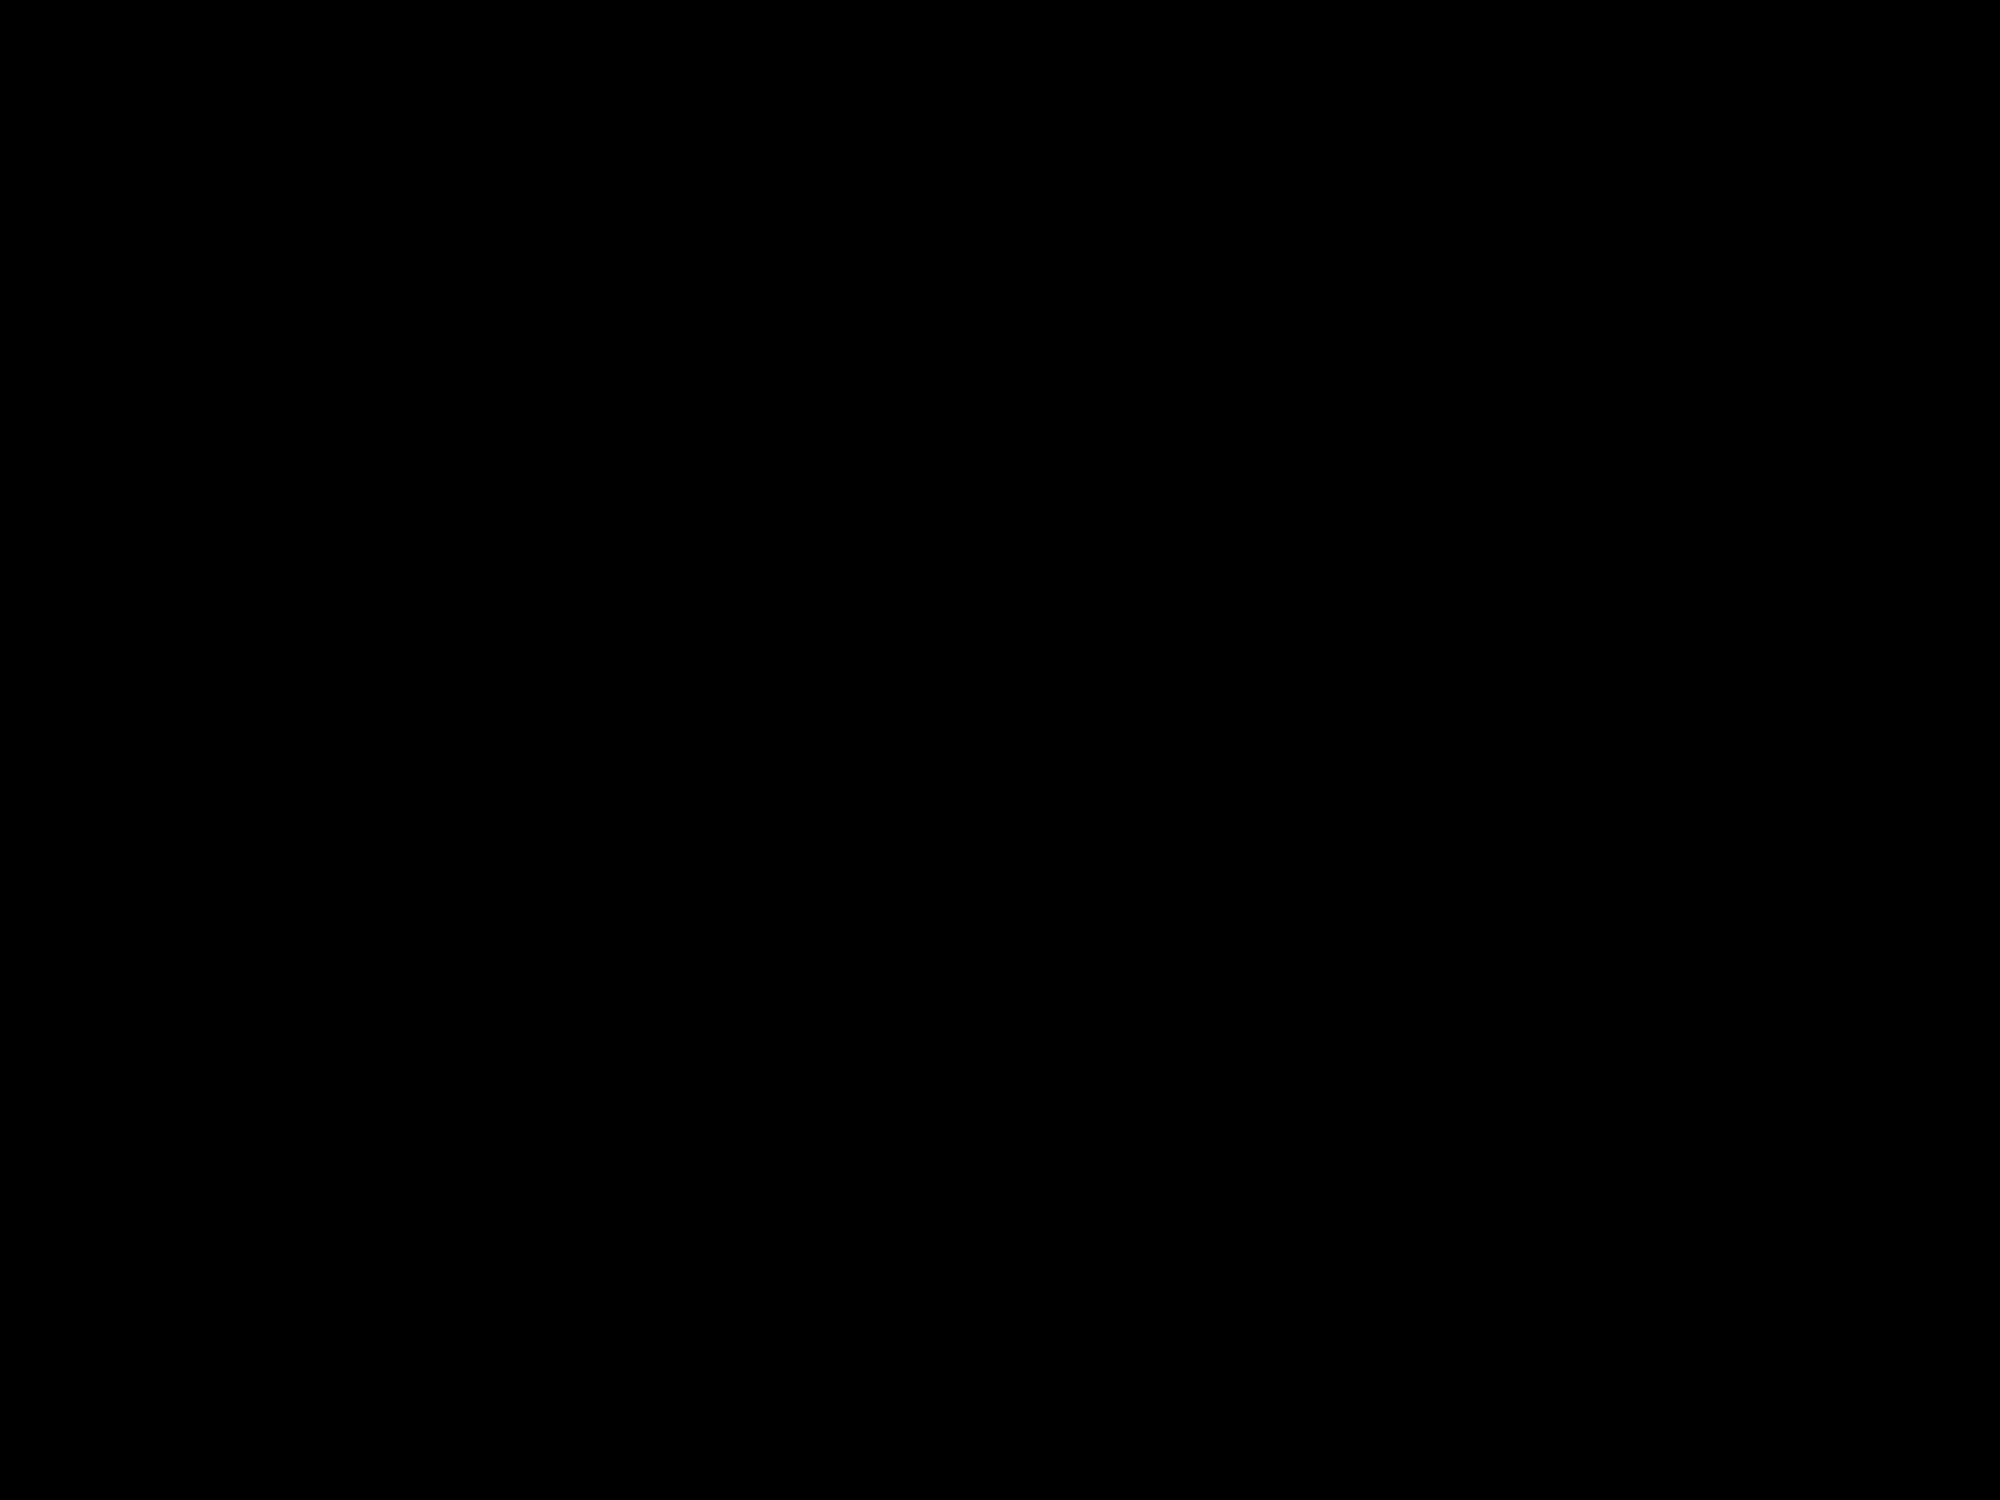 vector transparent stock Vector bands celtic pattern. Wedding knot symbol image